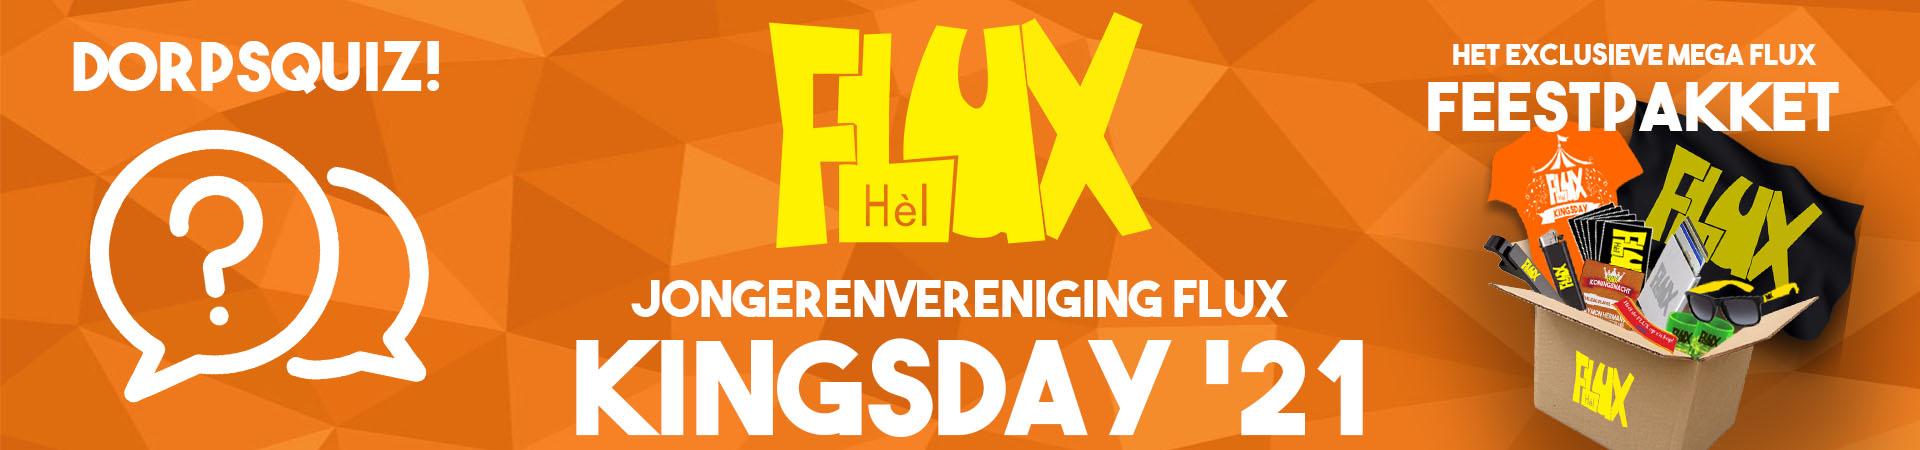 Flux Hedel online ticketing